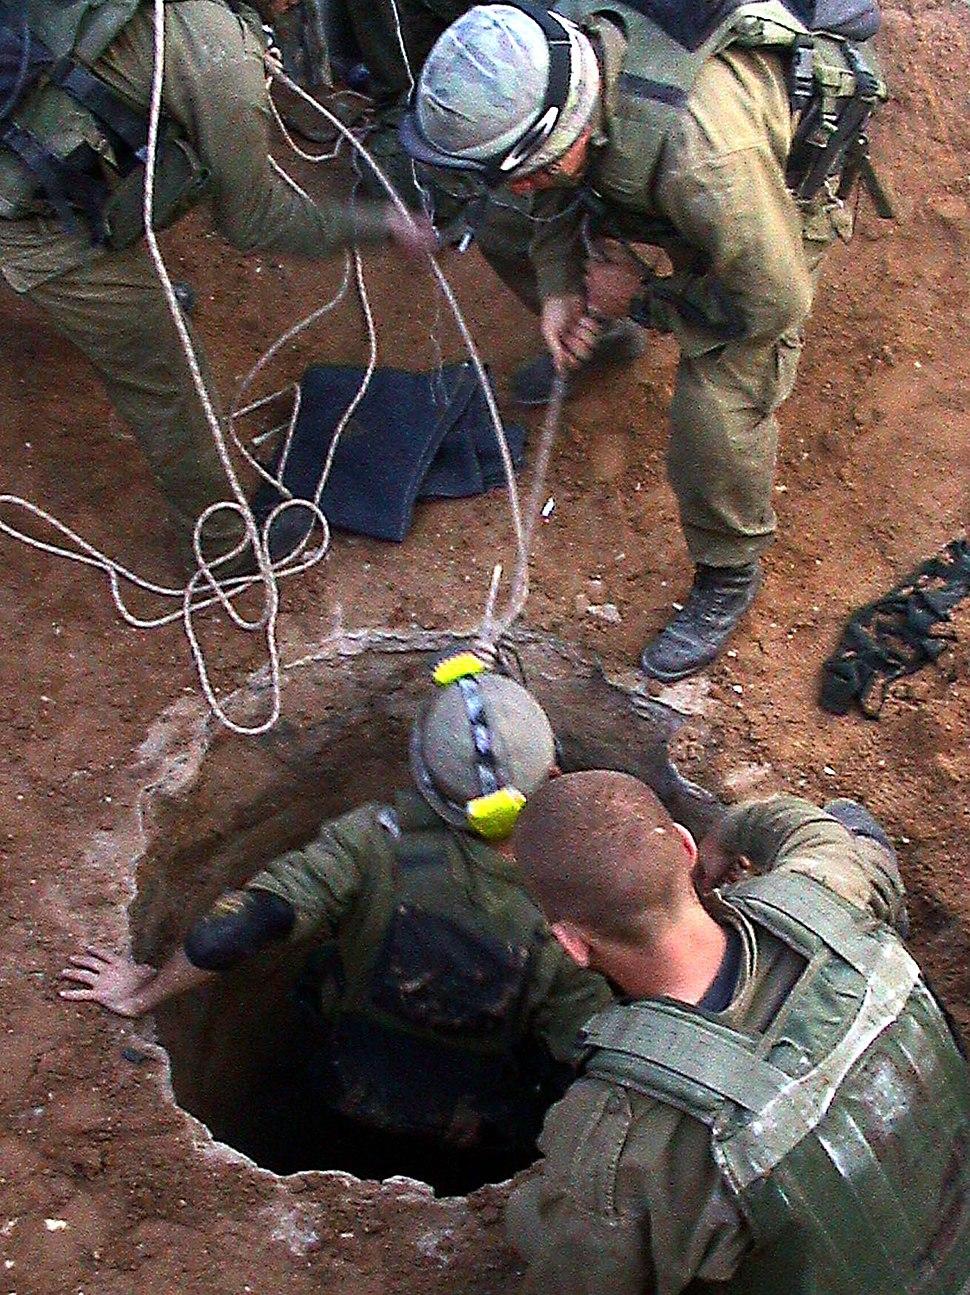 Flickr - Israel Defense Forces - 40 Kilogram Explosive Found At Bottom of Tunnel